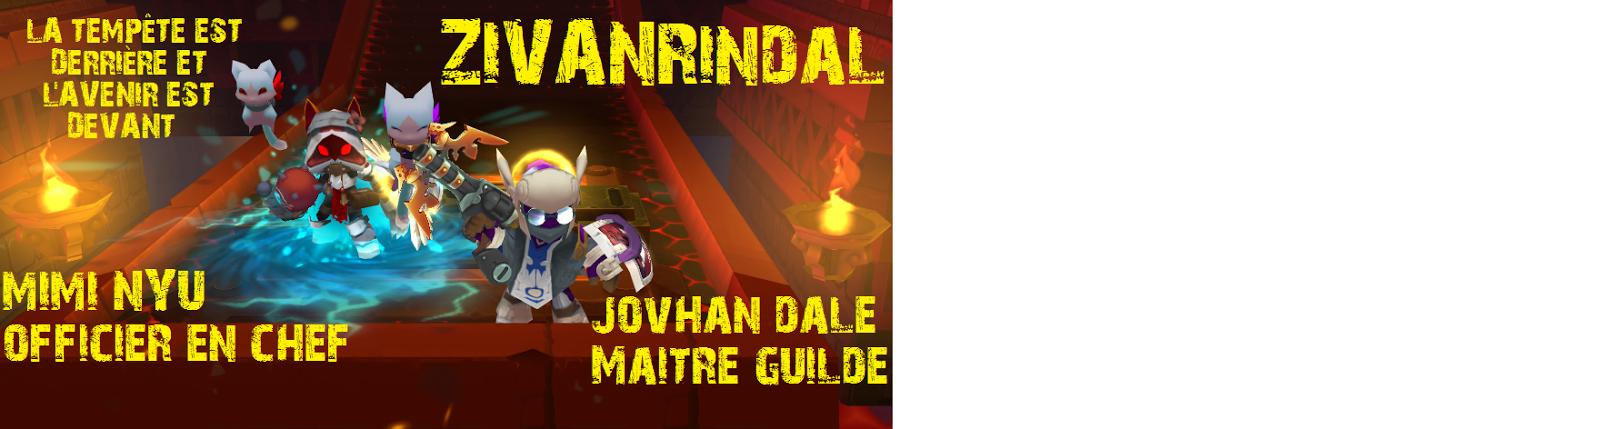 ZIVANRINDAL - GUILDE SPIRAL KNIGHT